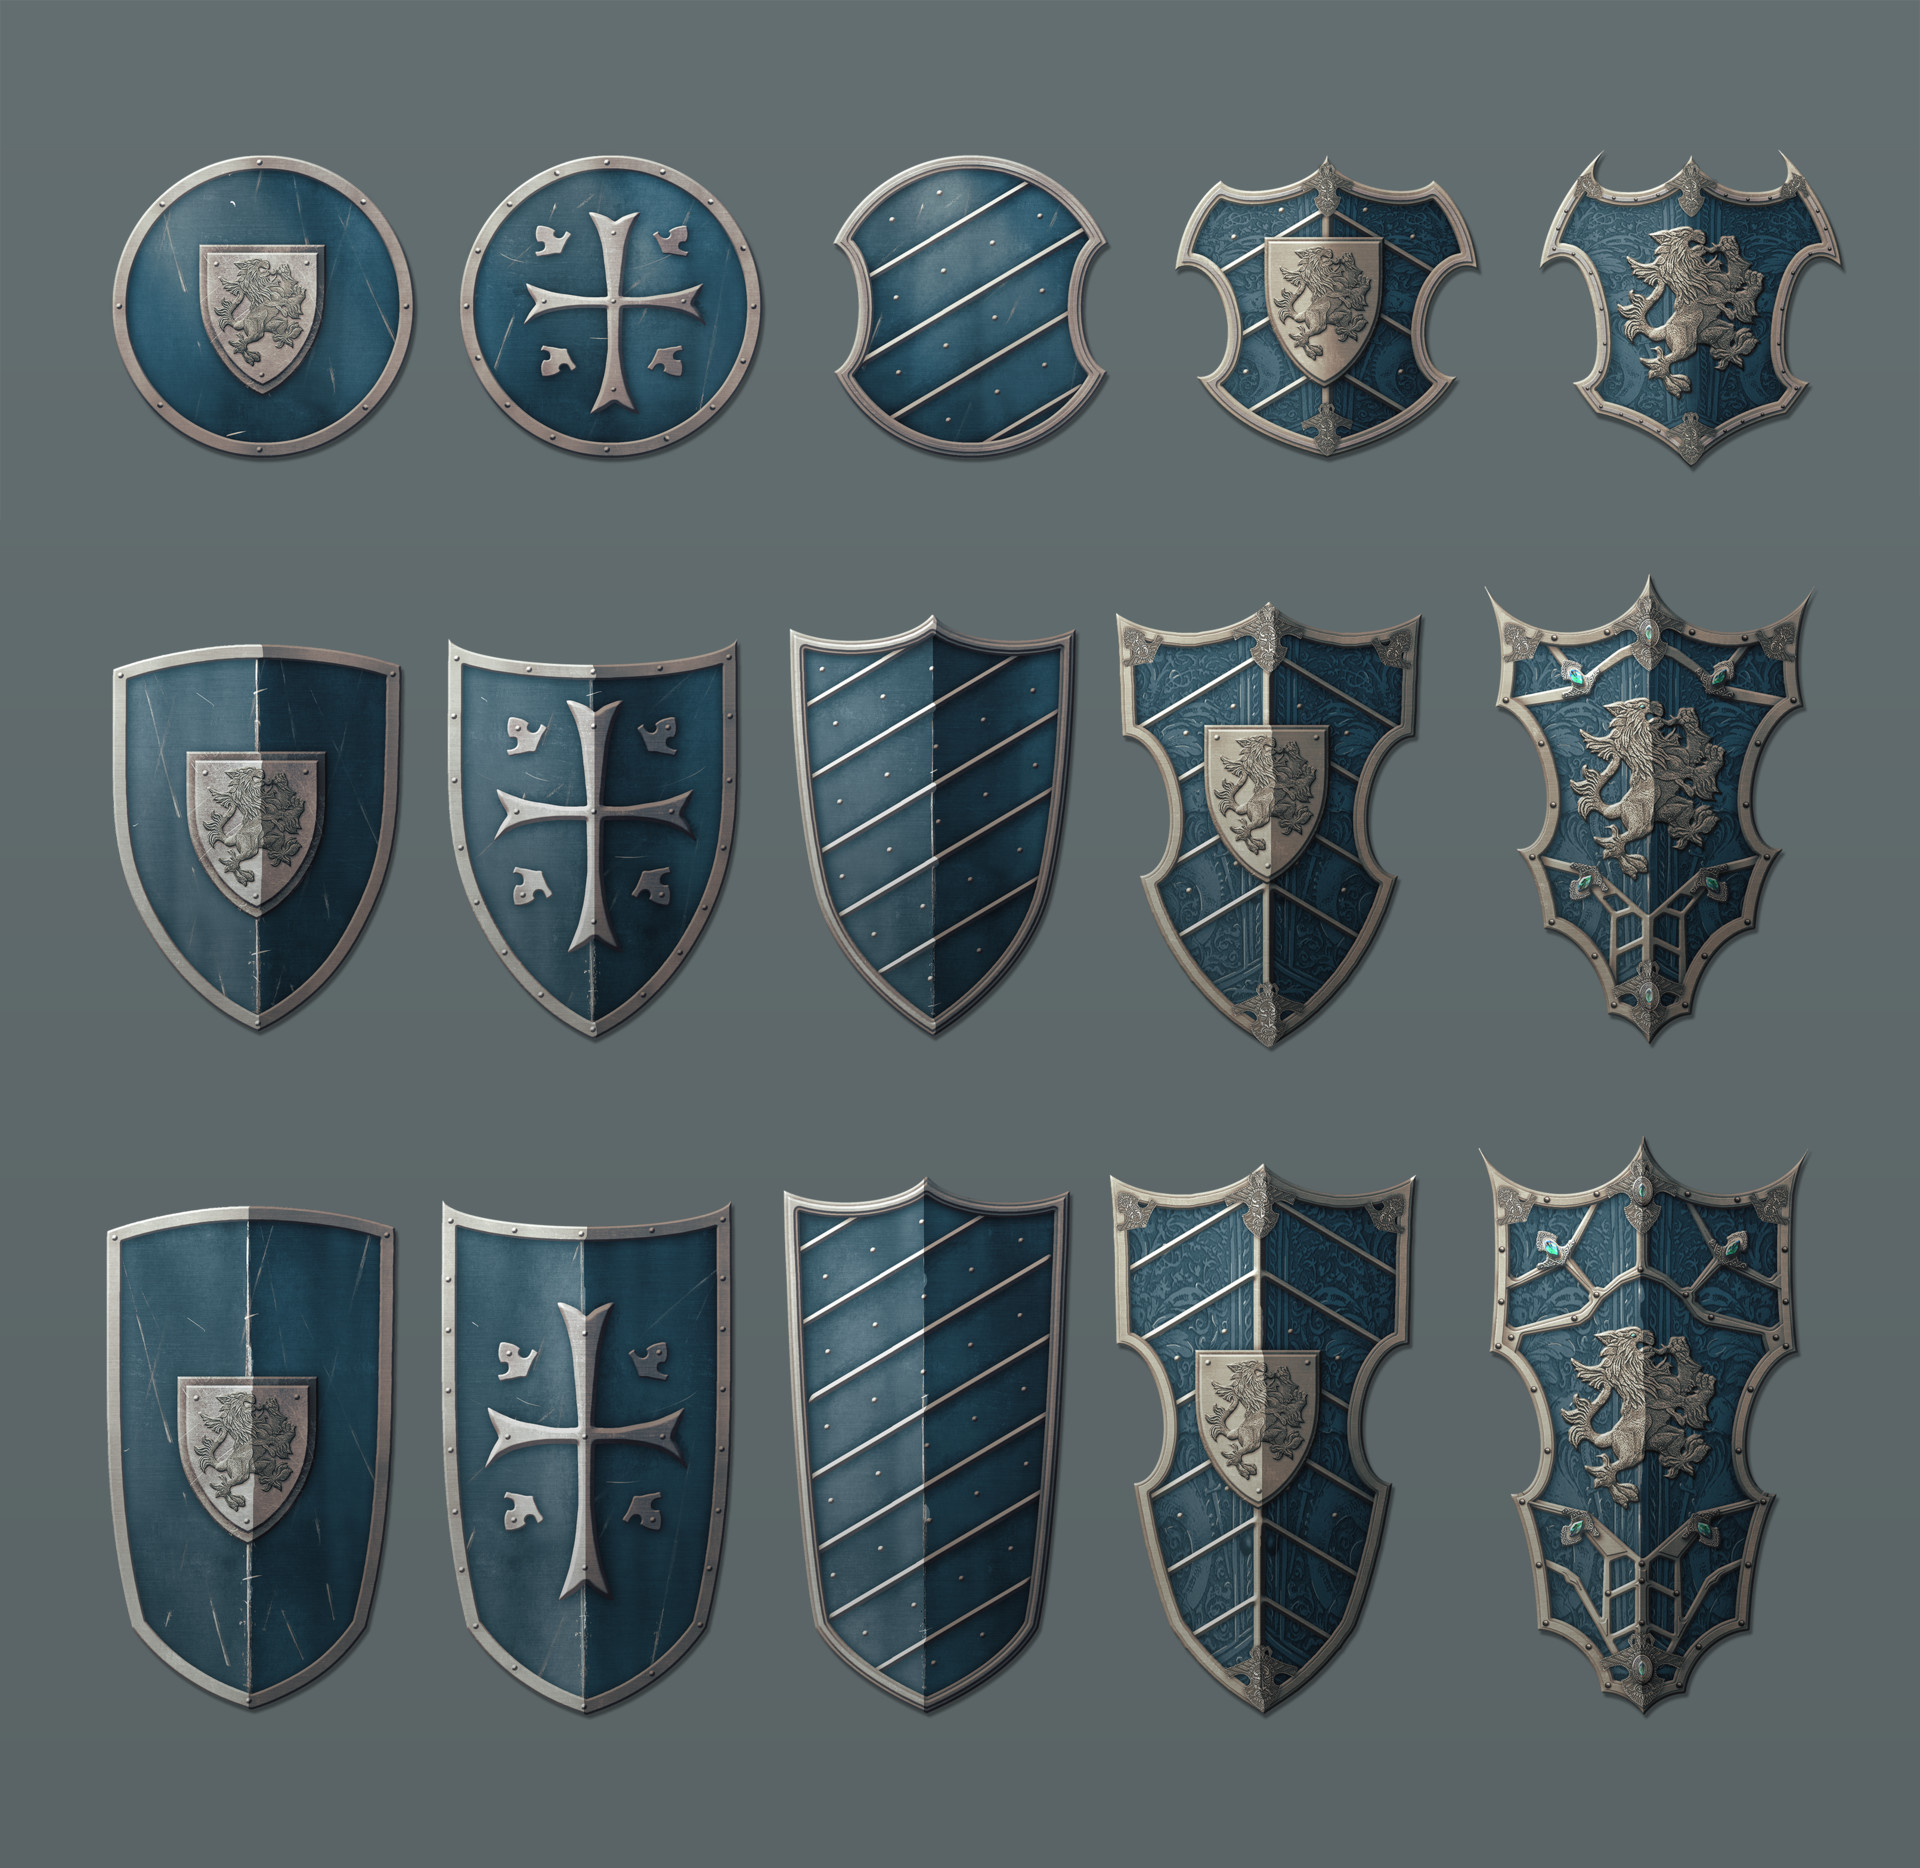 George k shields group